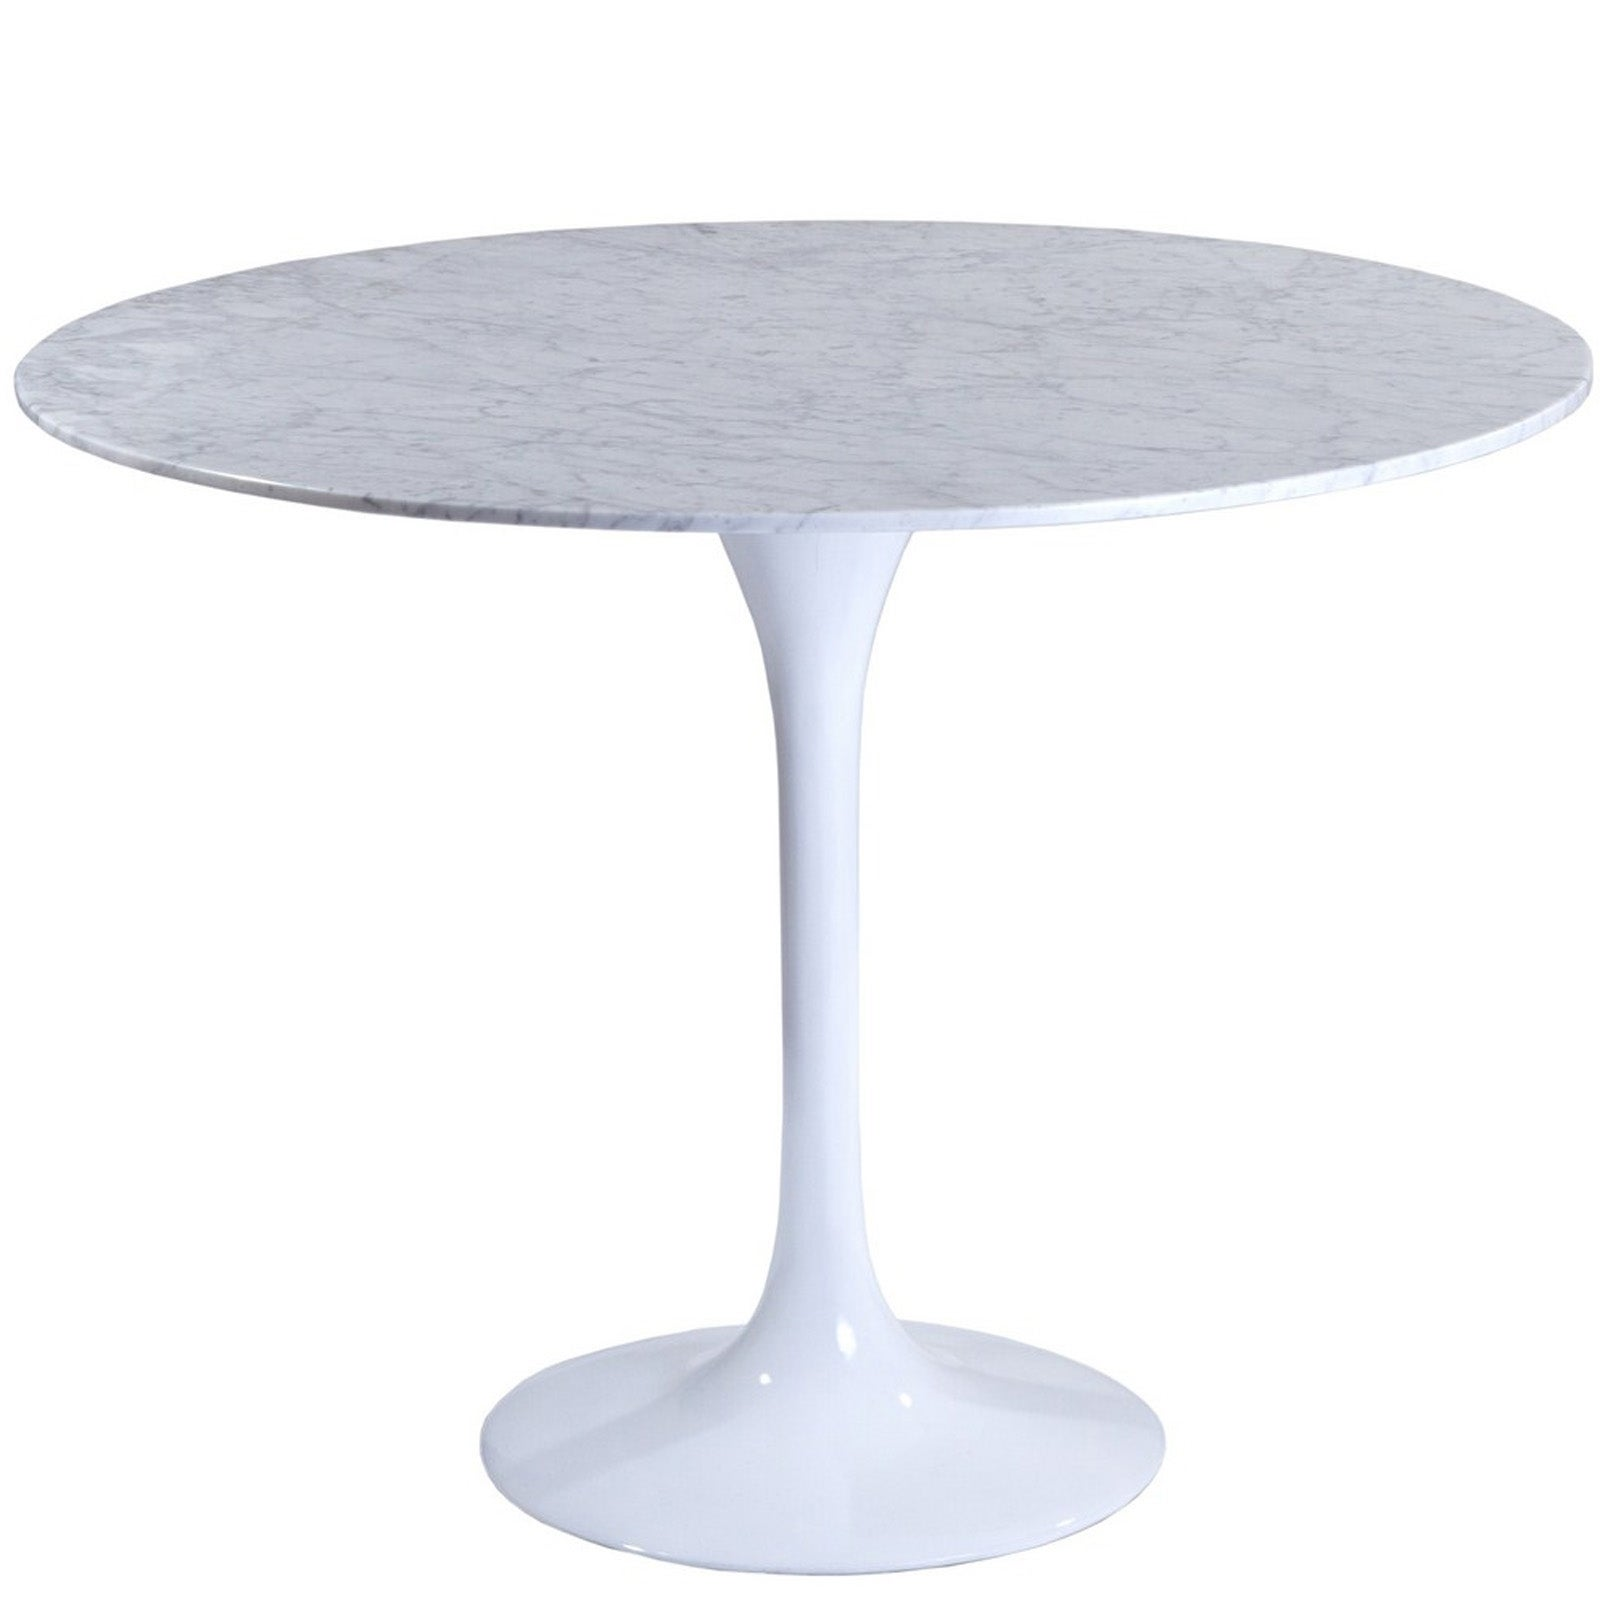 Eero Saarinen Style 40 Inch White Marble Top Tulip Dining Table